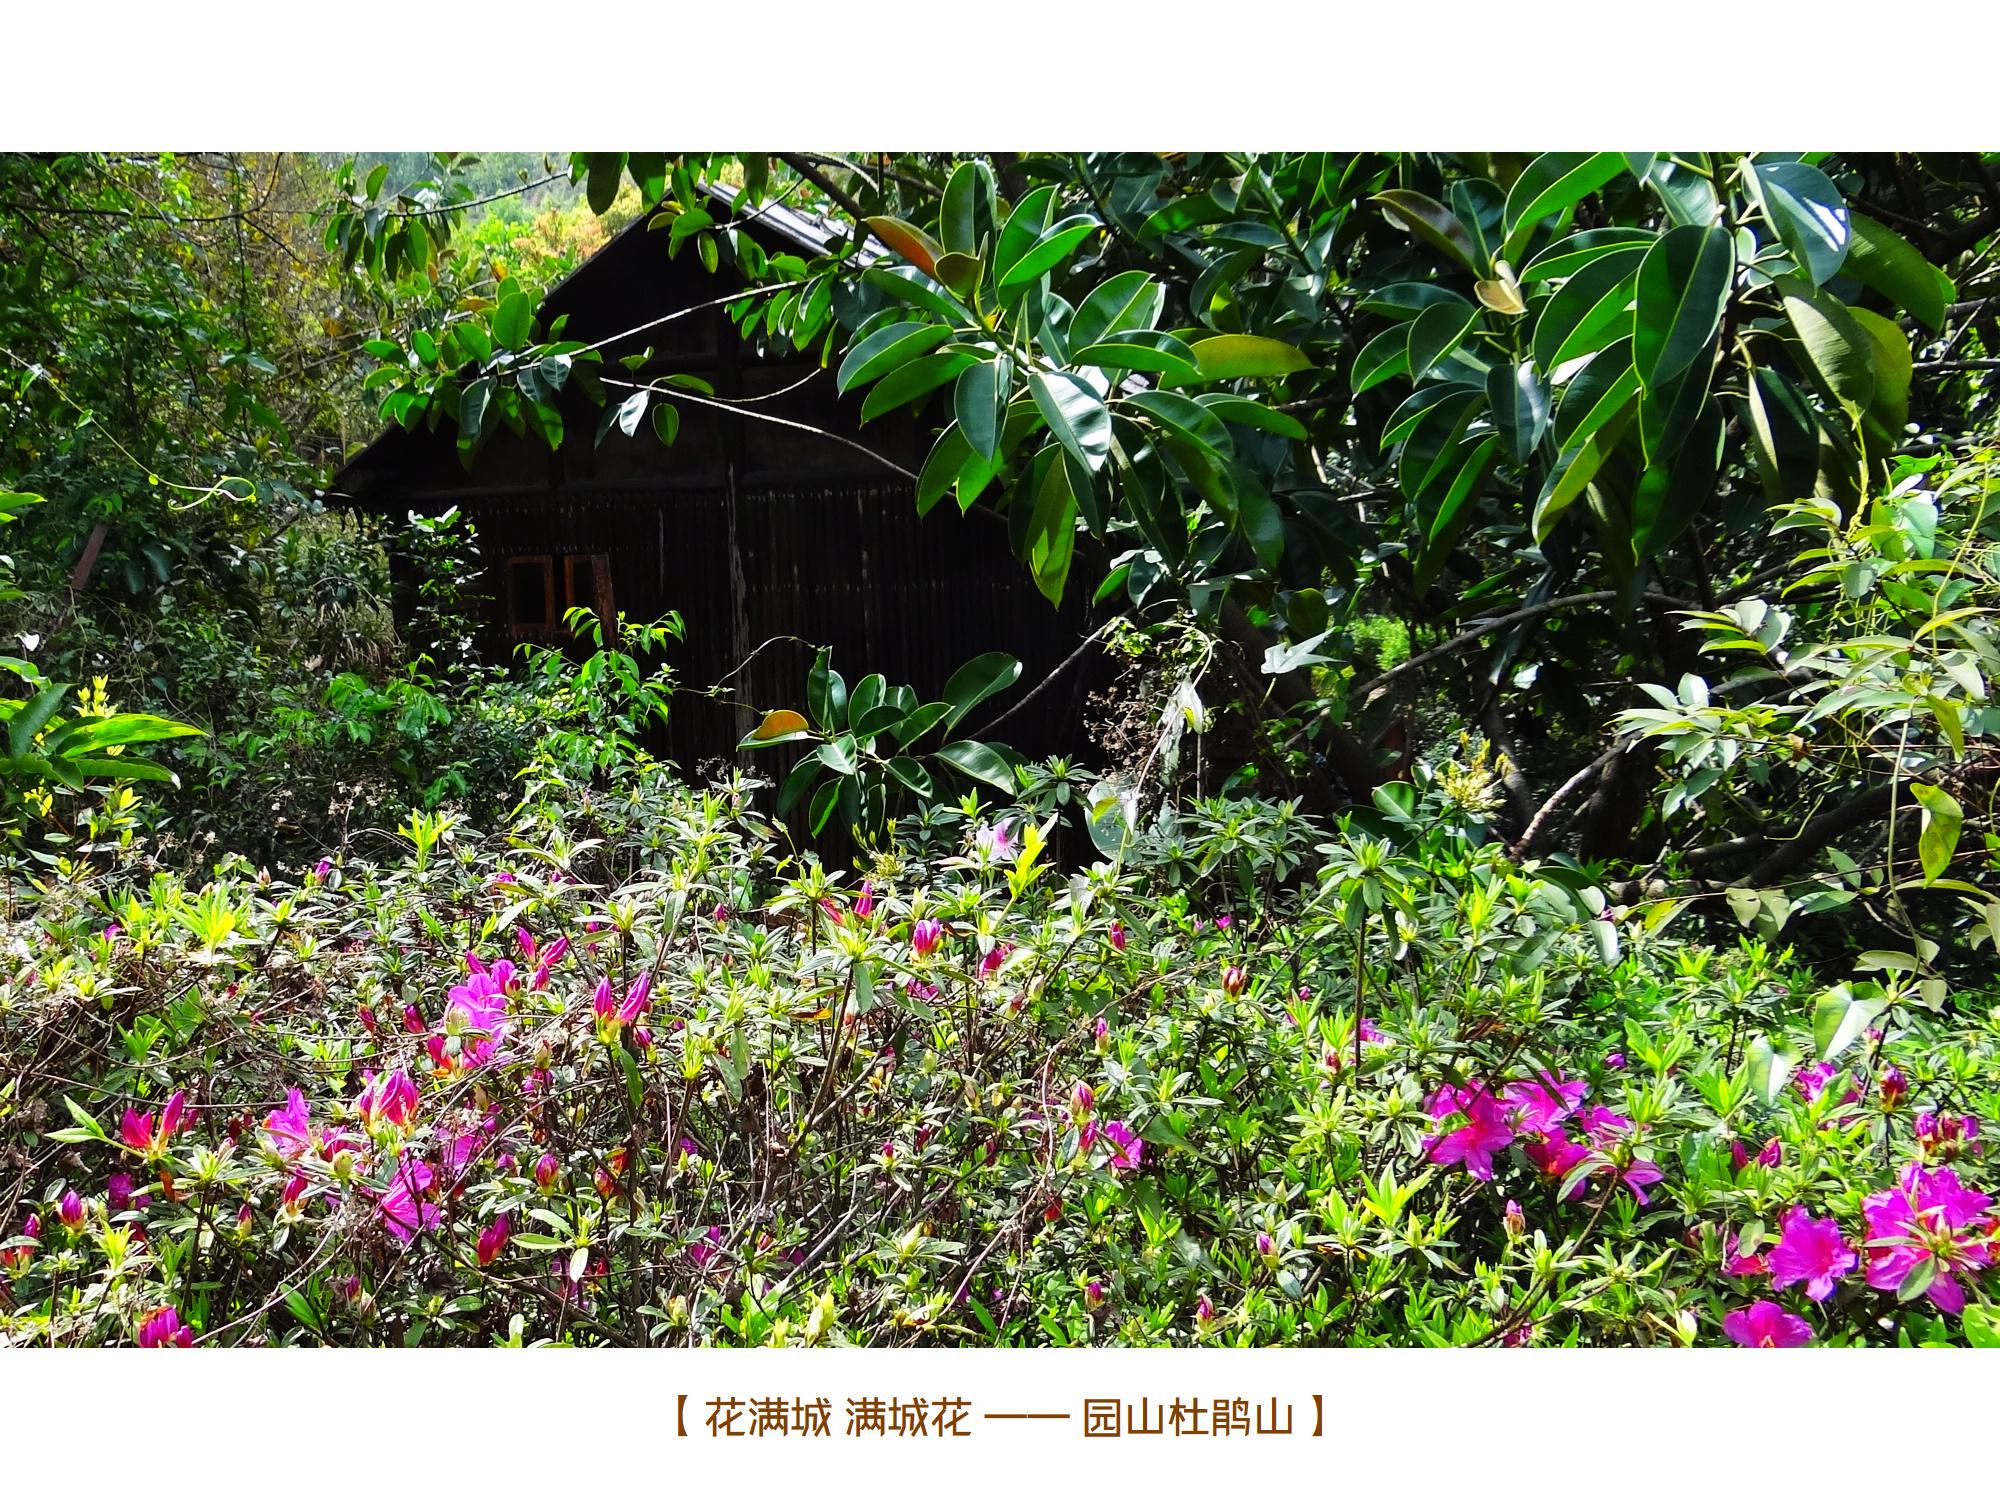 DSC00723 园山杜鹃山.jpg